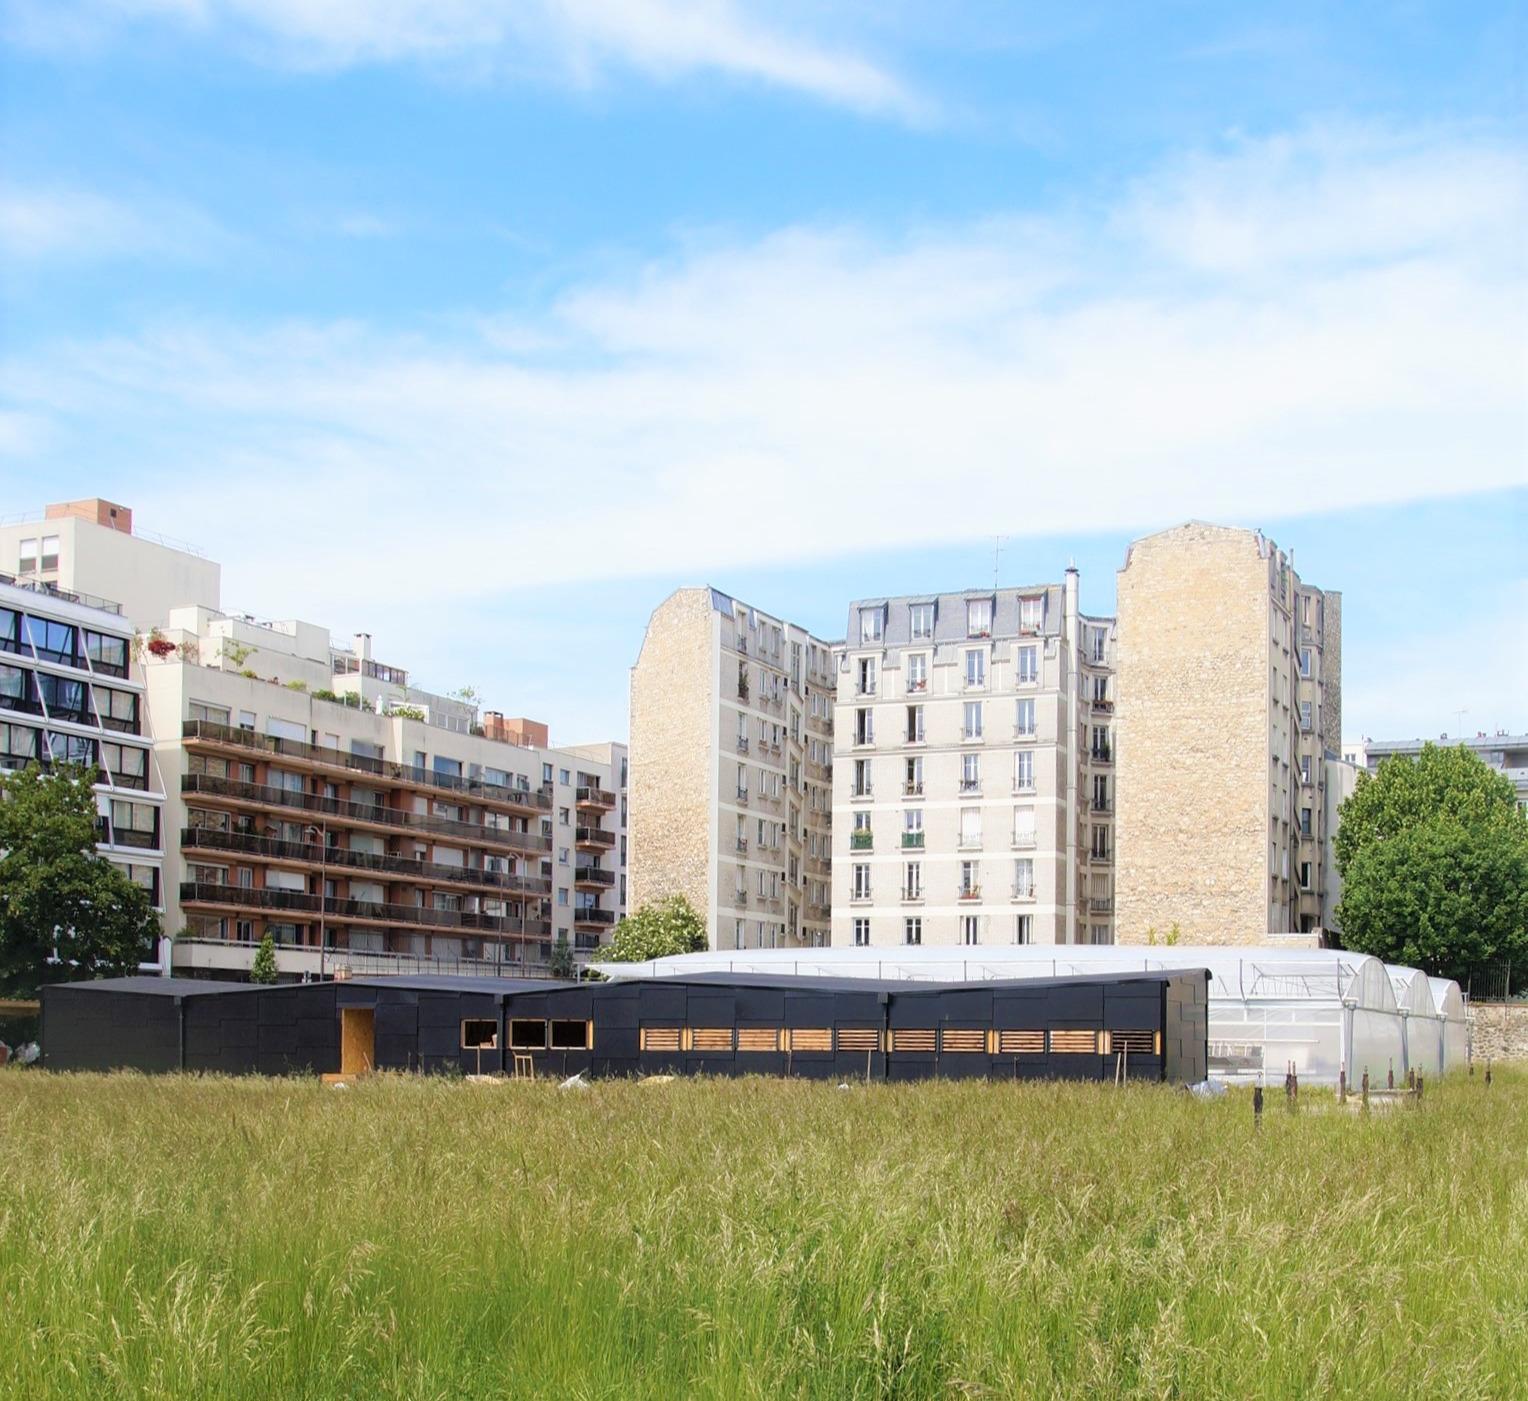 ferme urbaine Paris - Charonne